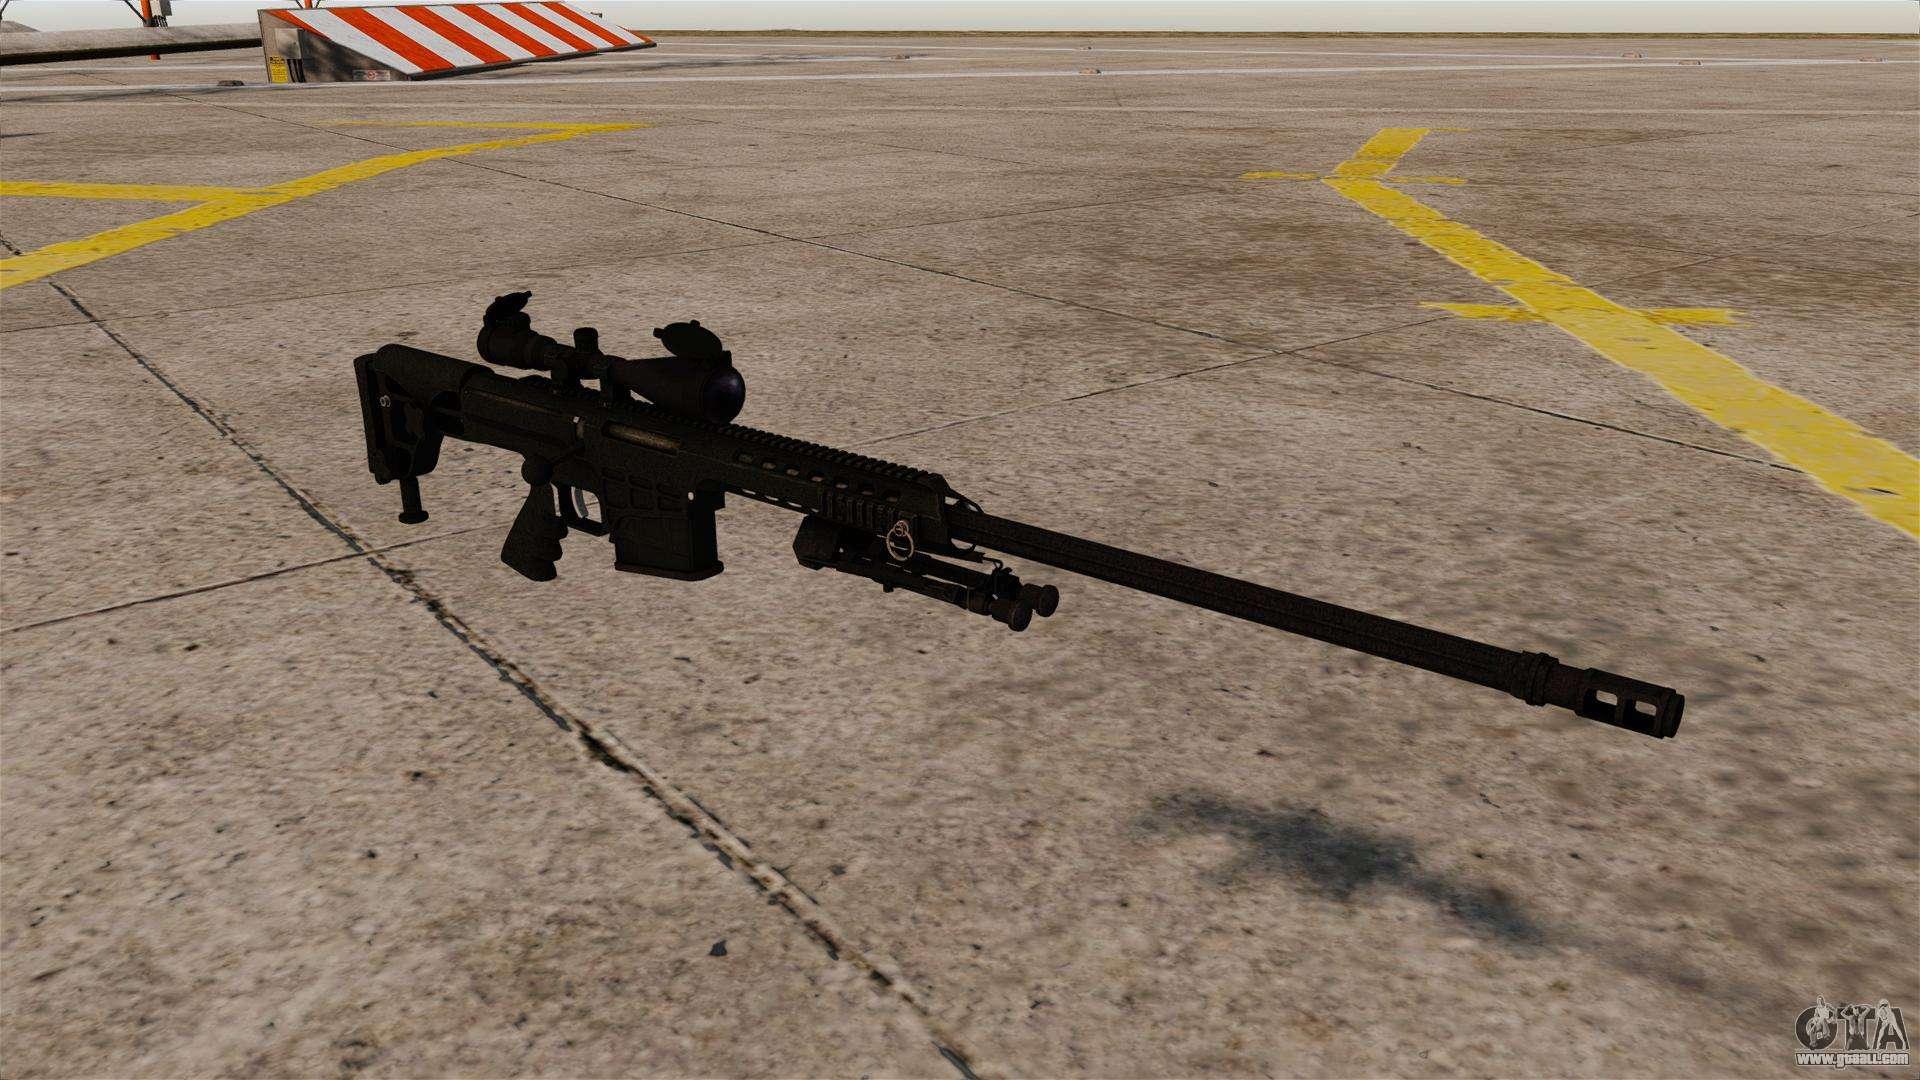 m98b sniper rifle - photo #21